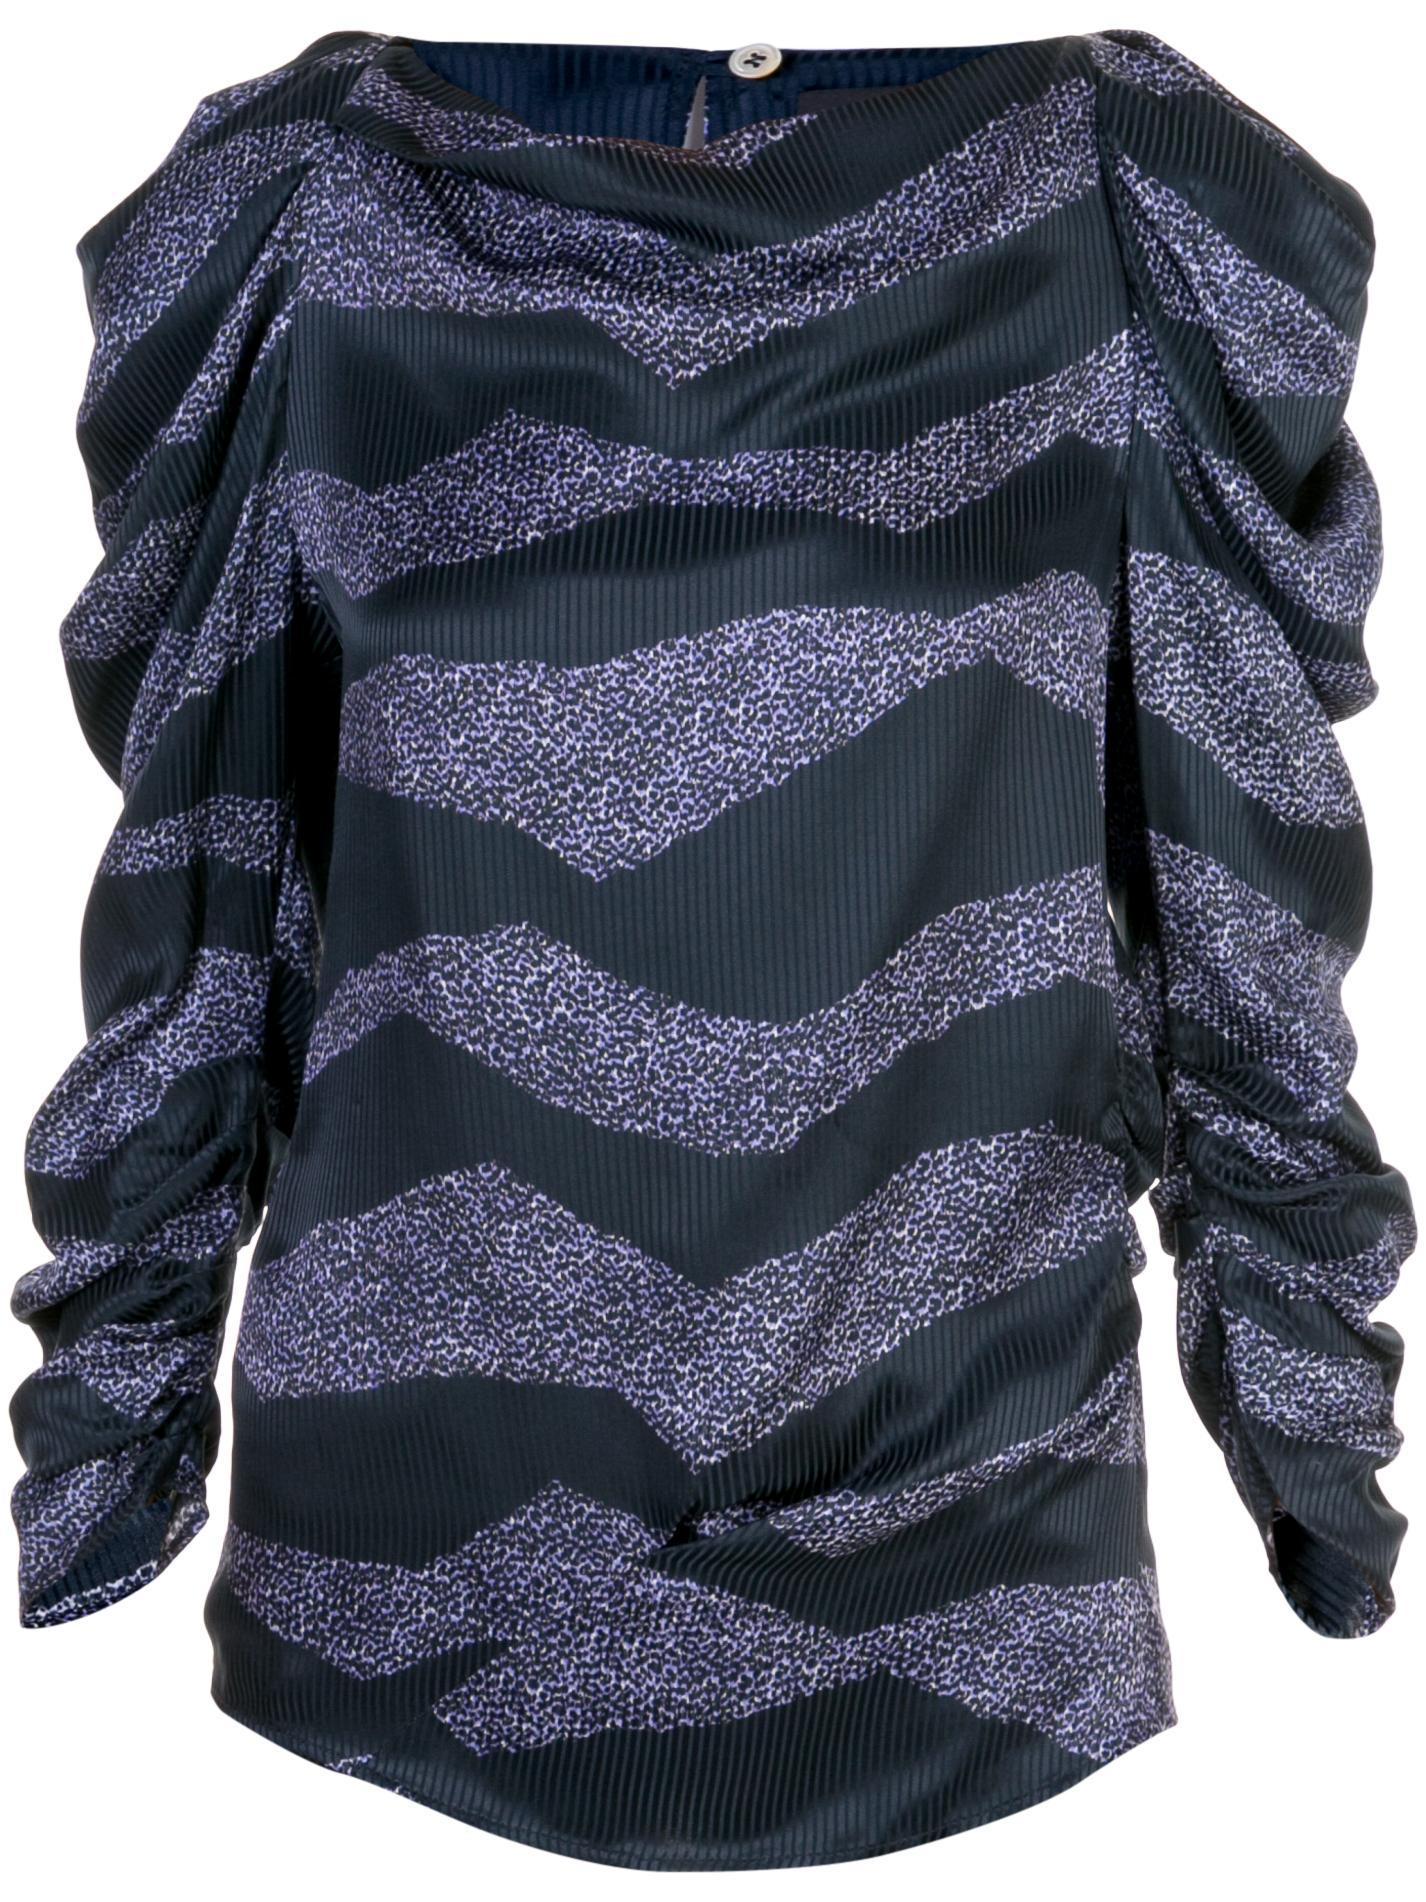 Long Sleeve New Zebra Print Blouse Item # CREM